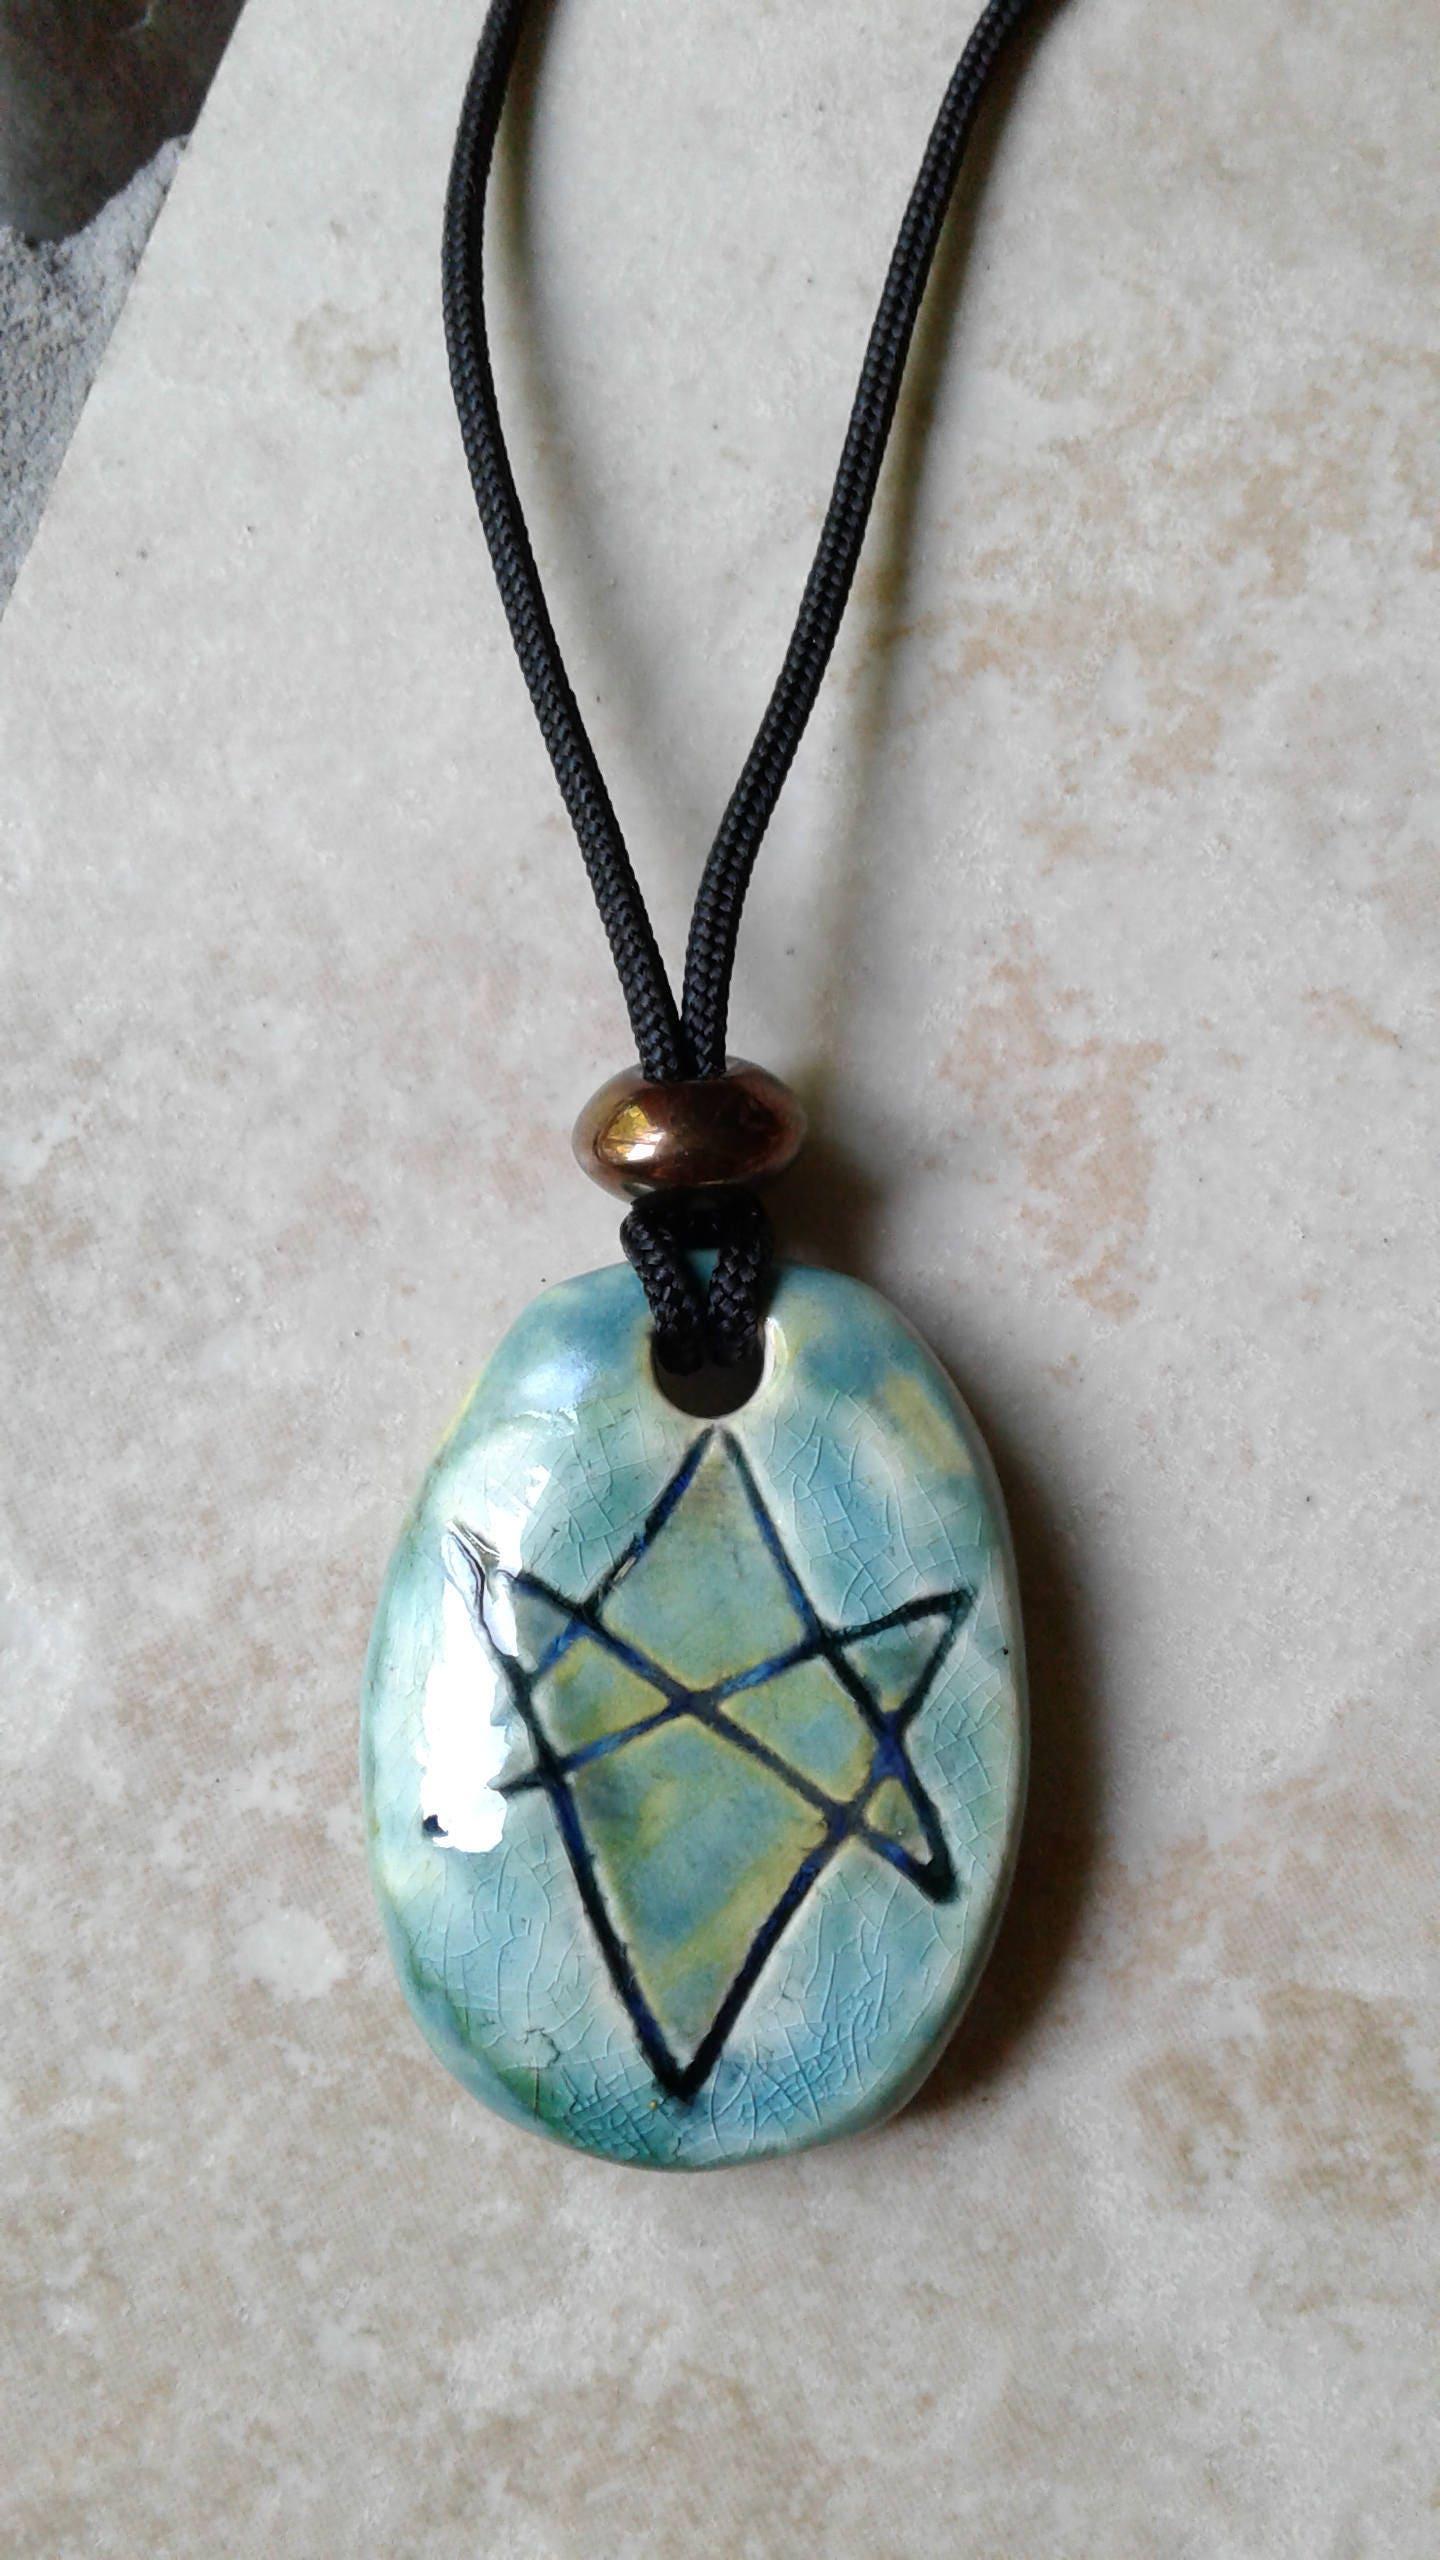 Mens aquarian star necklace sea turquoise ceramic unicursal mens aquarian star necklace sea turquoise ceramic unicursal hexagram pendant seal of orichalcos men of letters mozeypictures Images